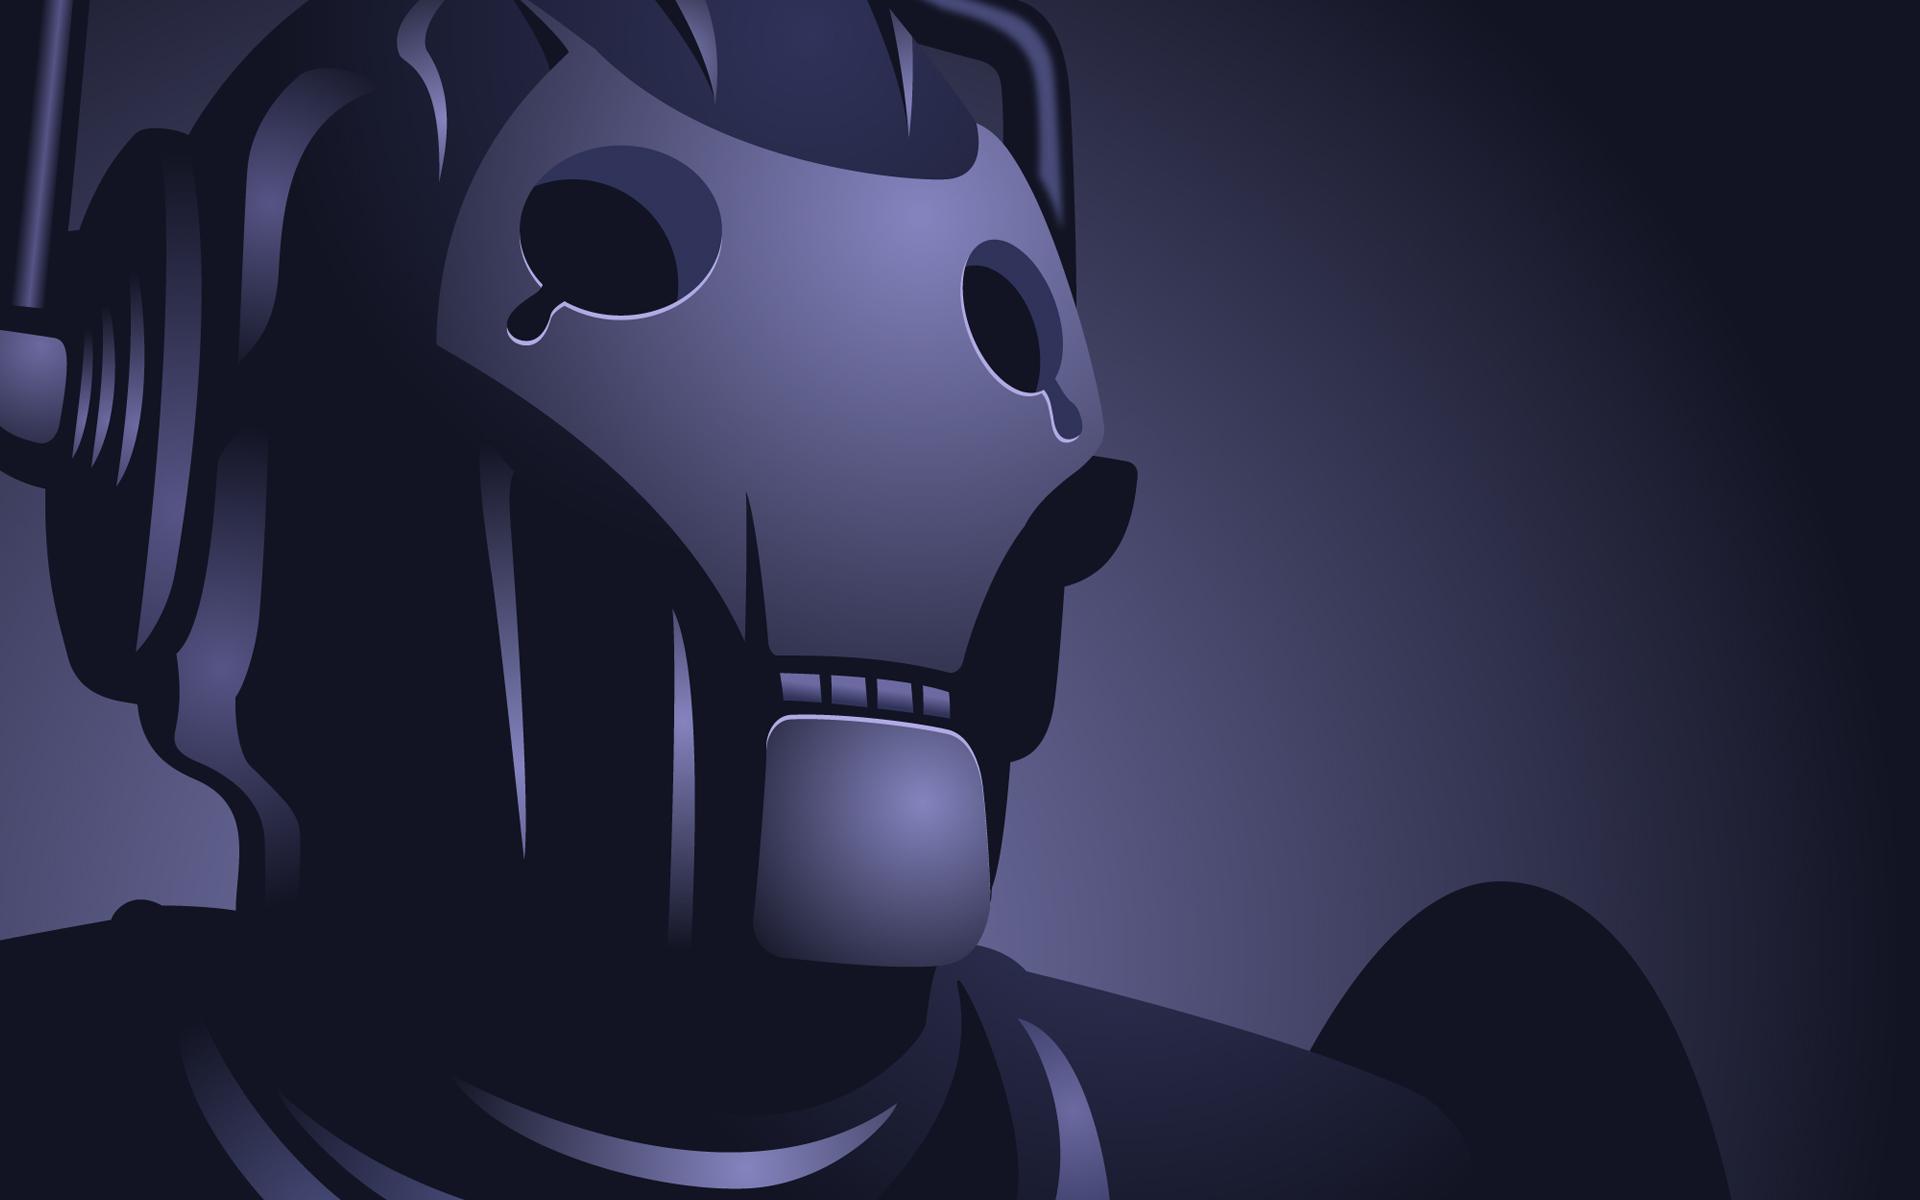 Cool Robot Wallpaper - WallpaperSafari